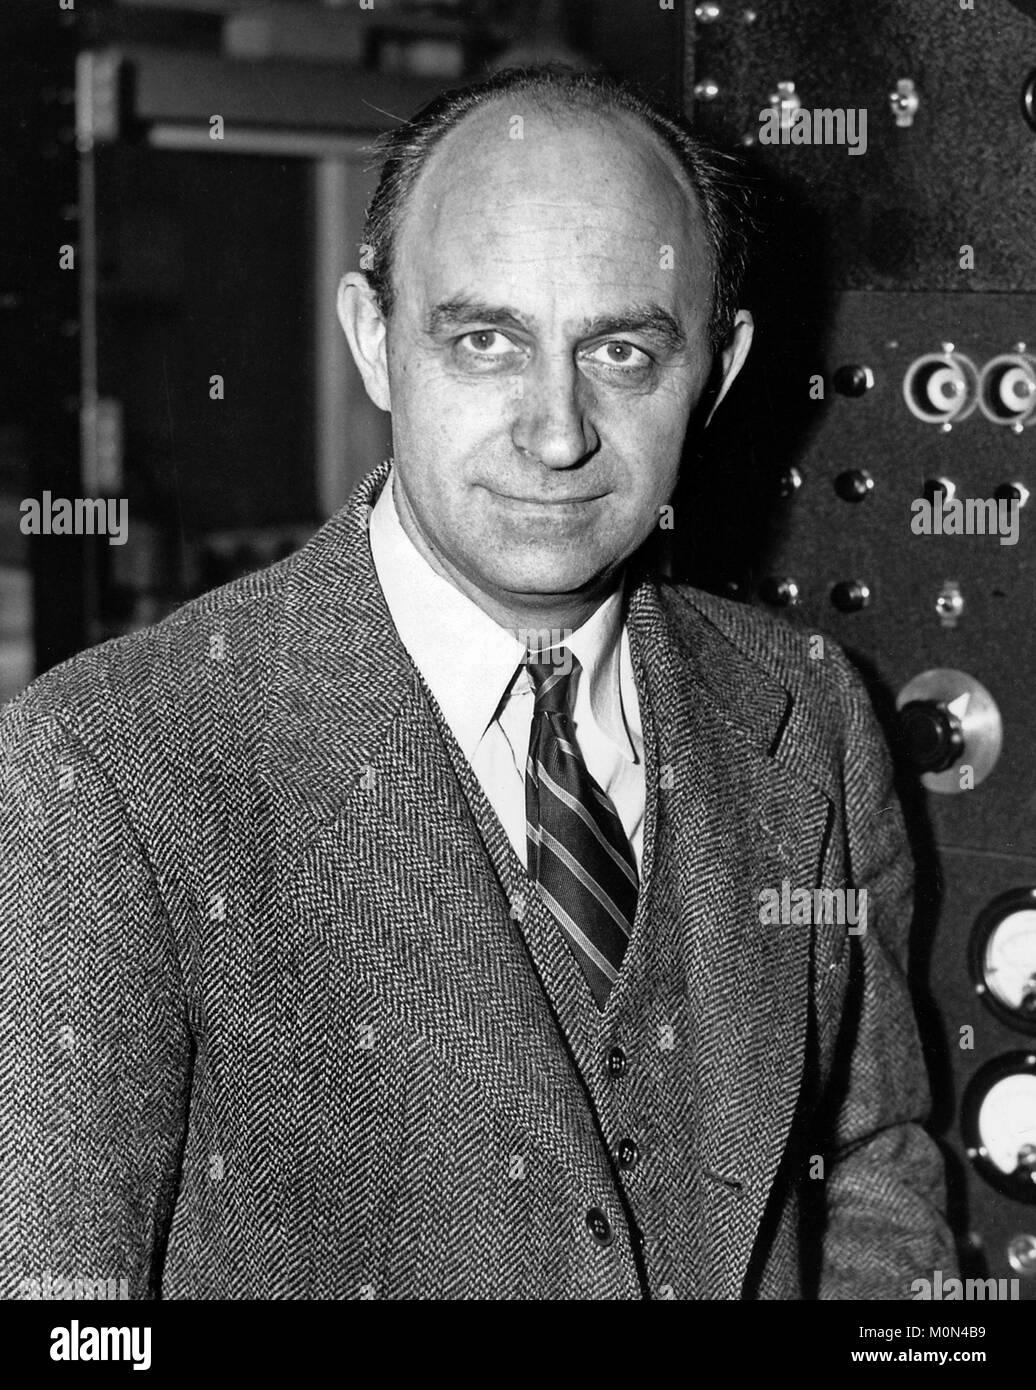 Enrico Fermi (1901-1954). Portrait of the Italian-American nuclear physicist, c.1943-6 Stock Photo